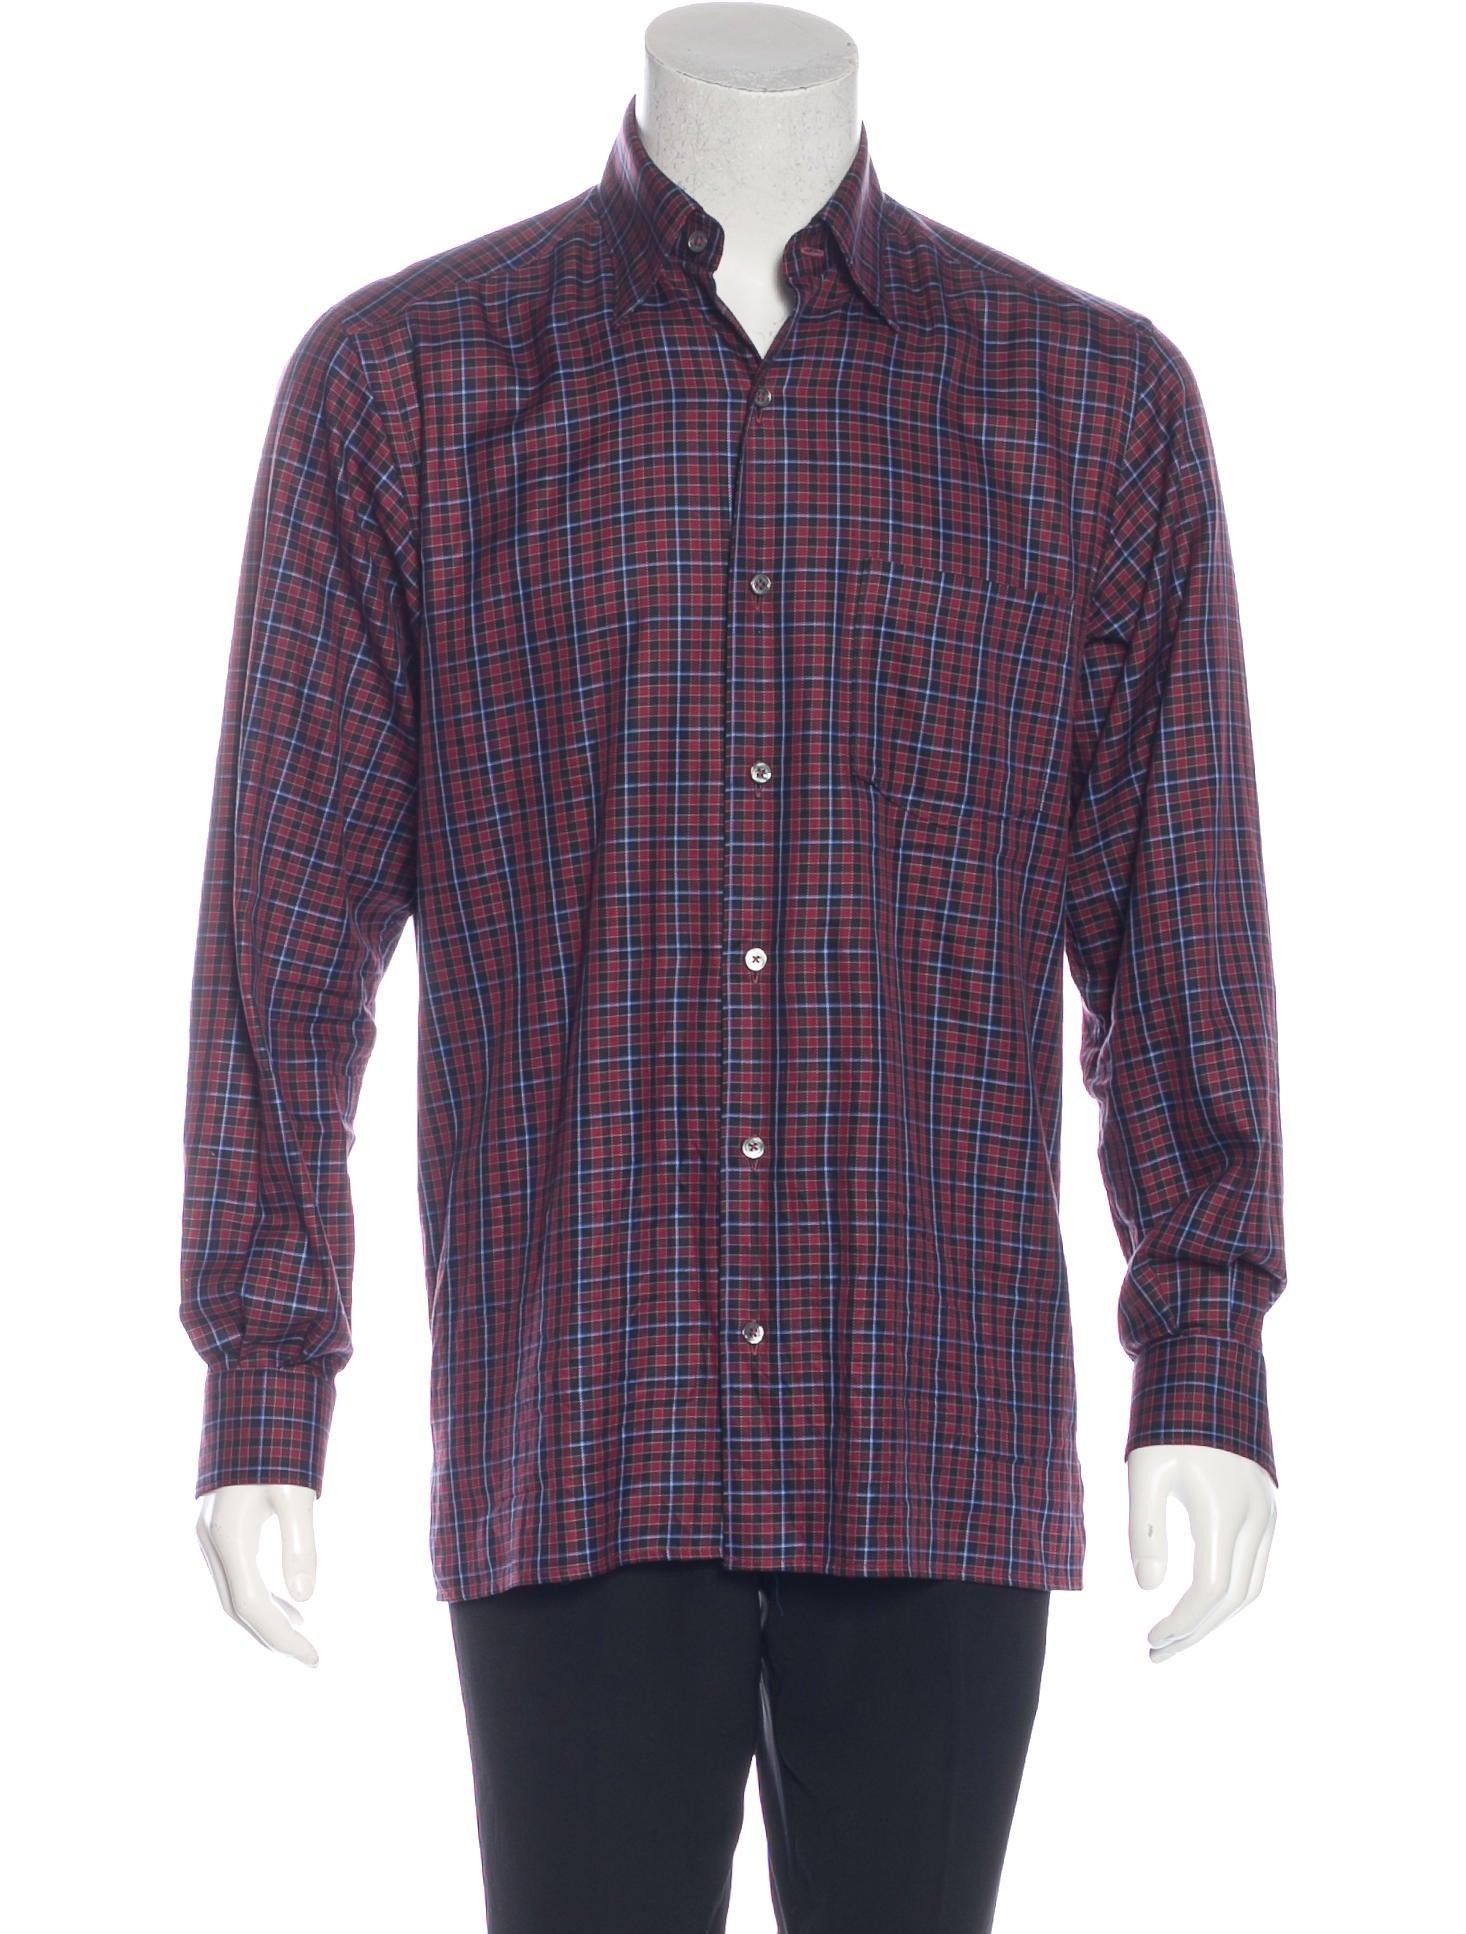 ermenegildo zegna plaid button up shirt clothing zgn24846 the realreal. Black Bedroom Furniture Sets. Home Design Ideas